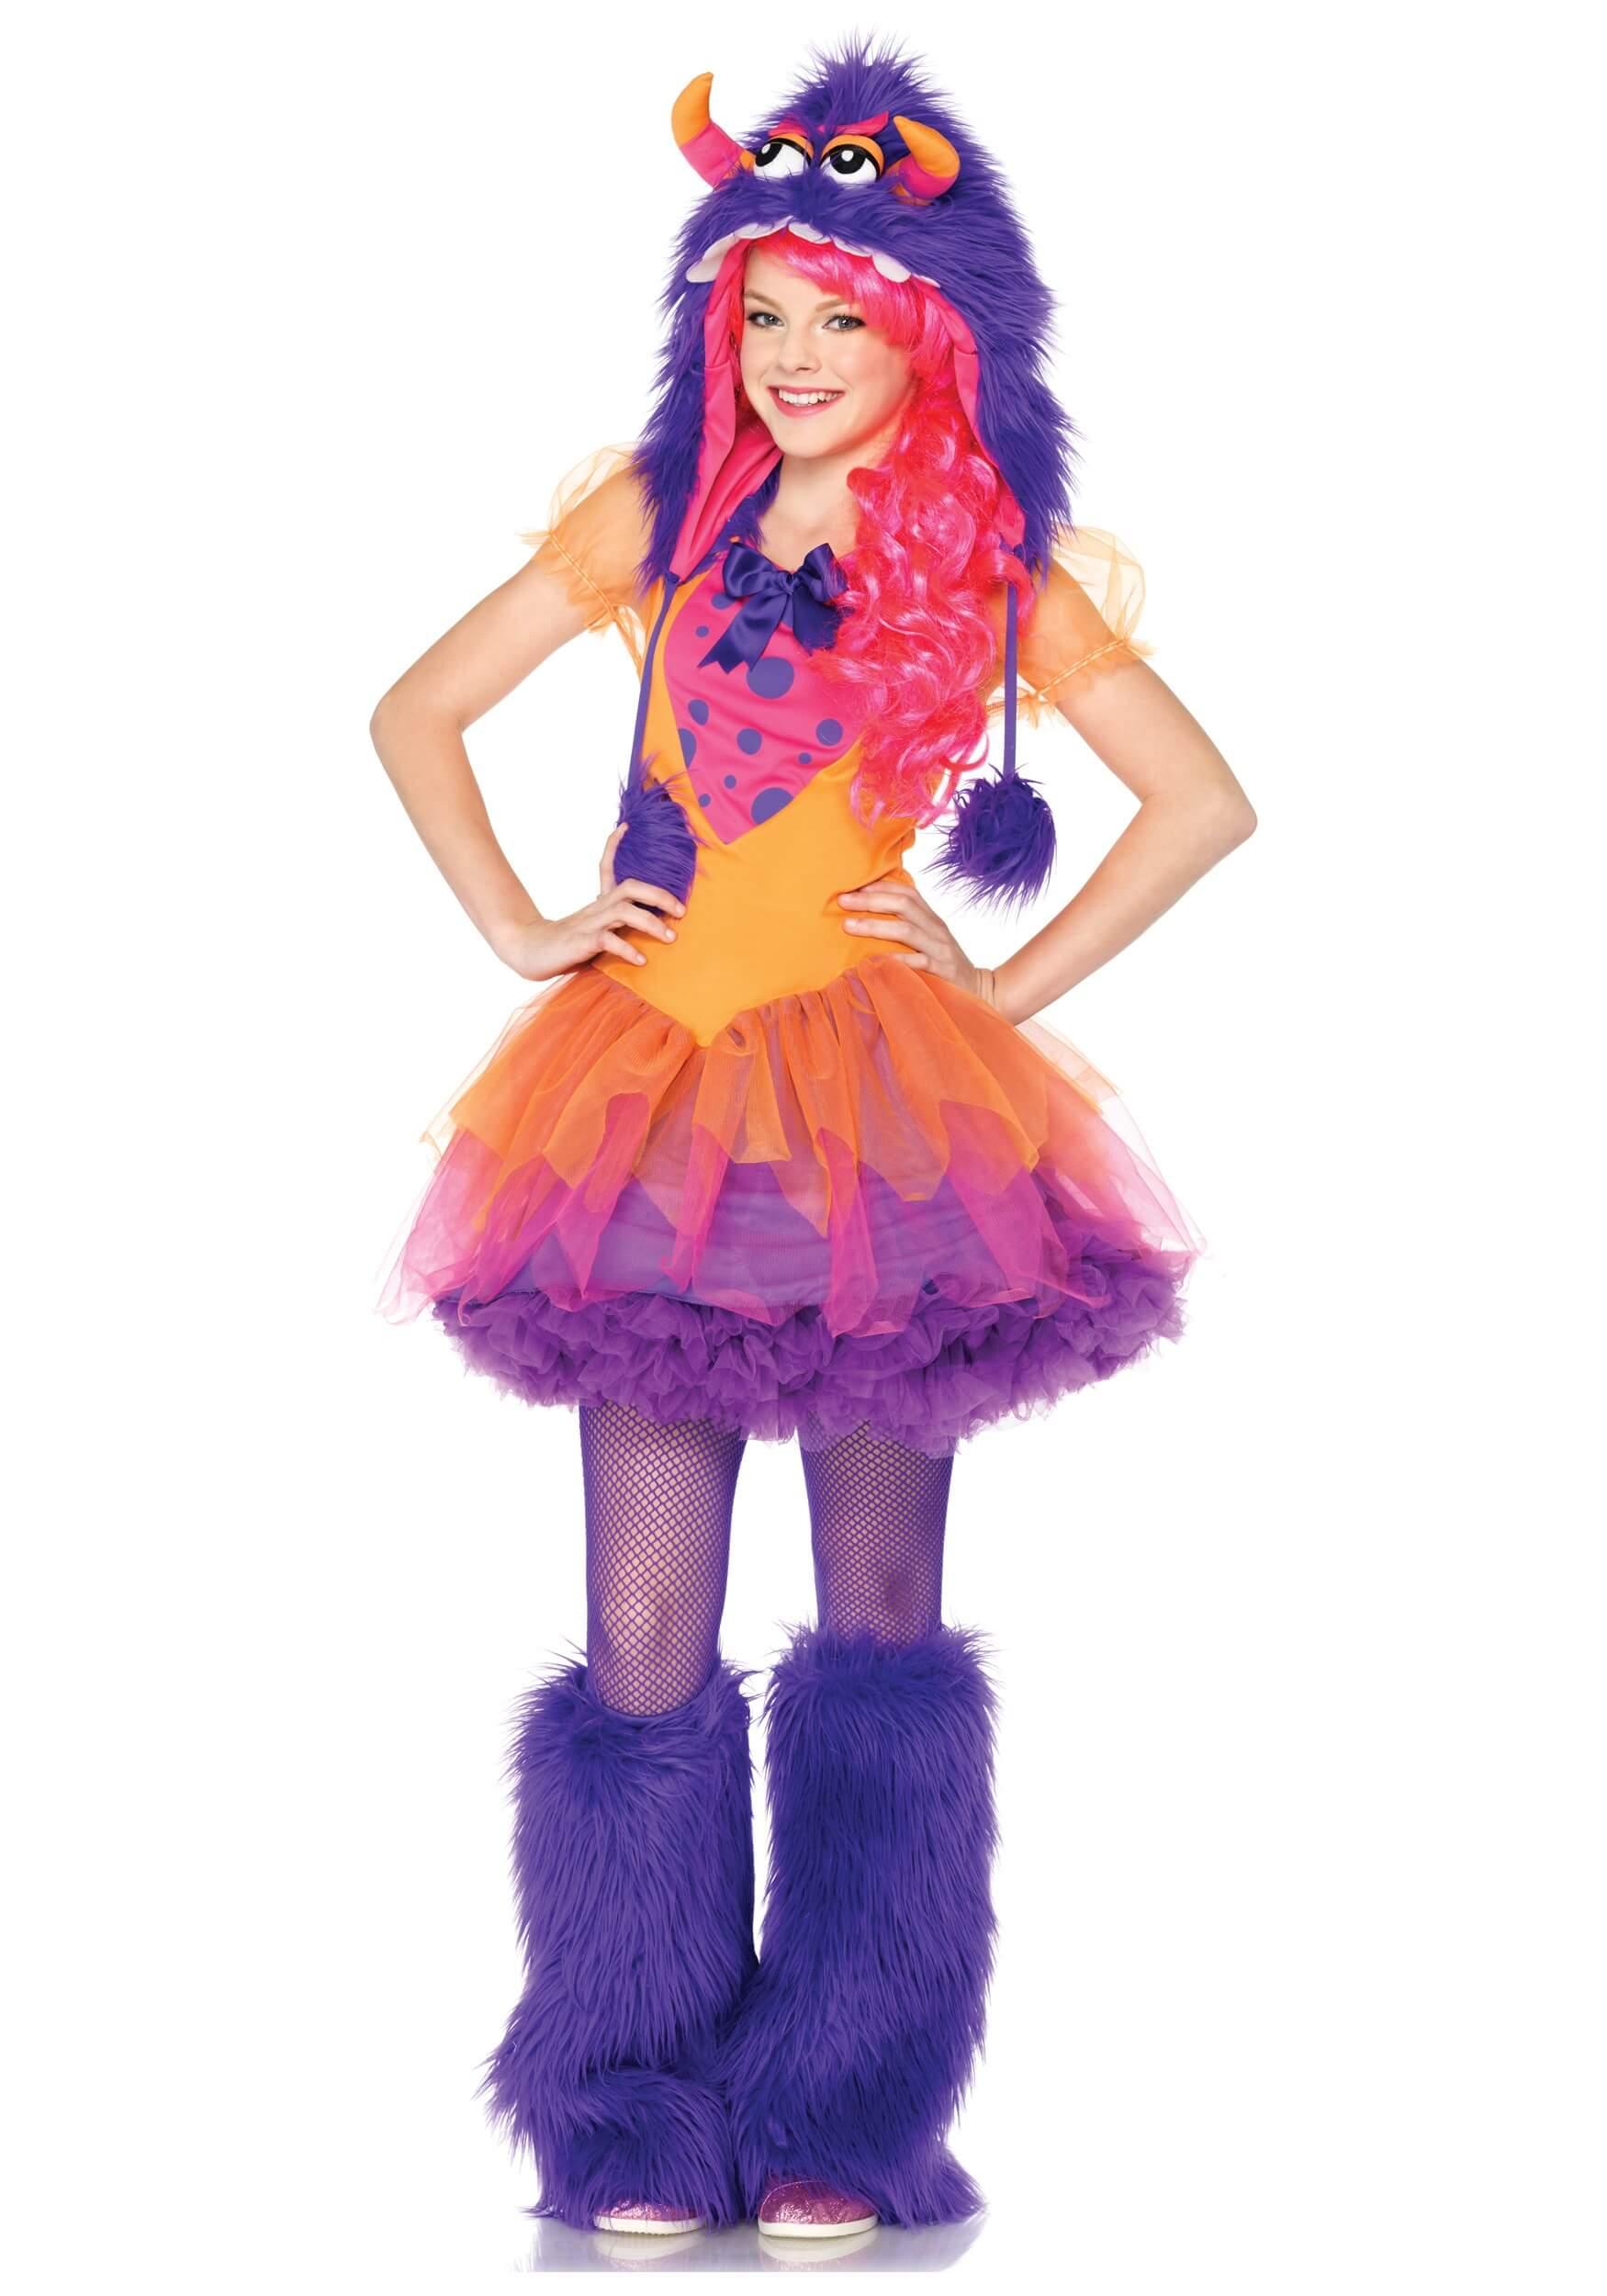 terrific halloween costume ideas for teens - festival around the world